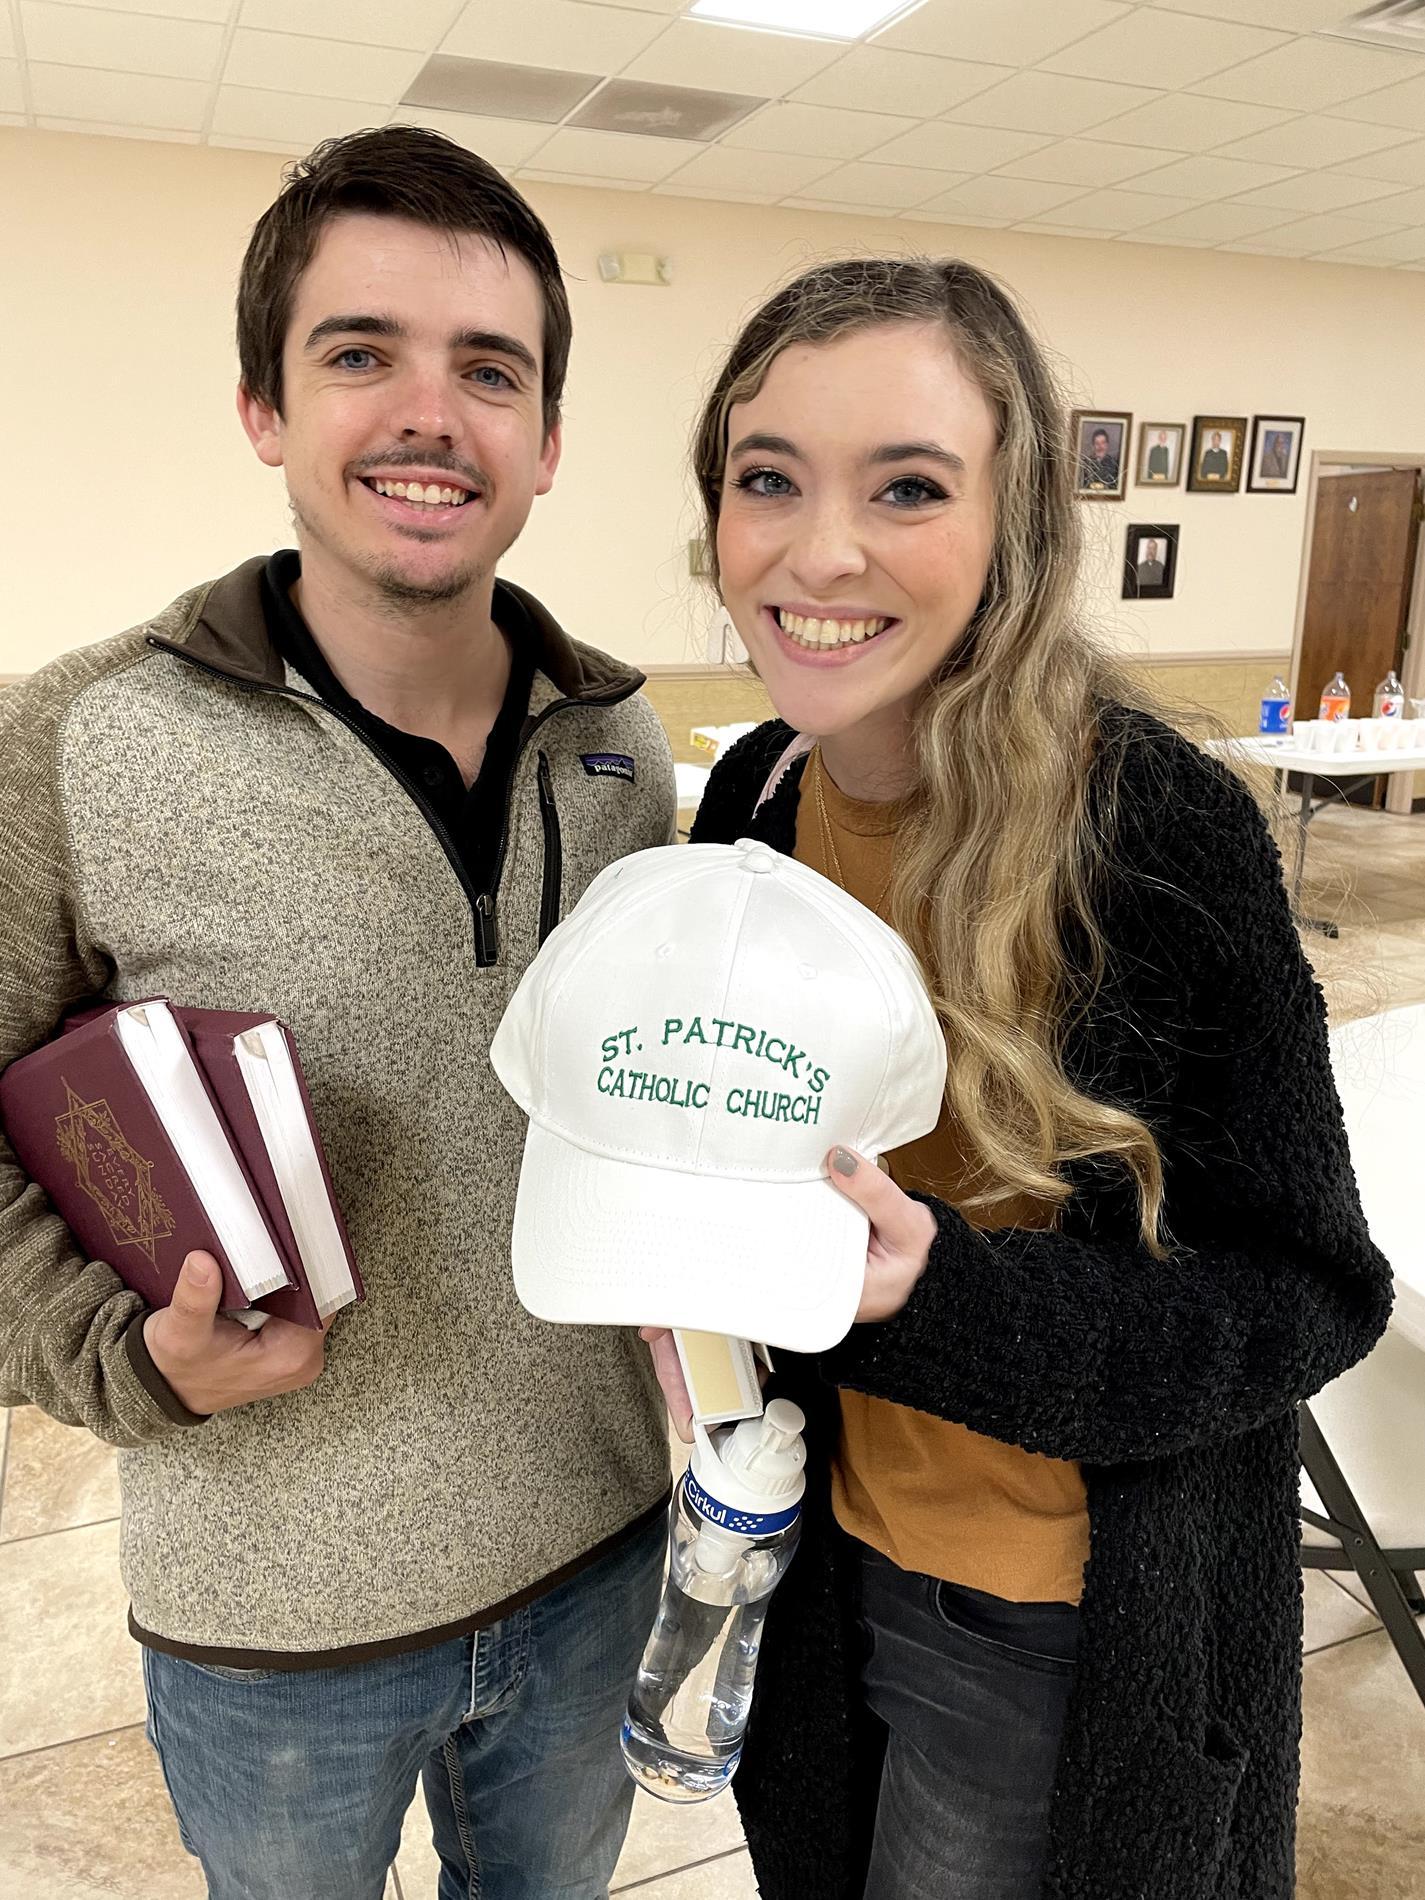 Gracie and Matt showing off their St. Patrick ball cap winnings.